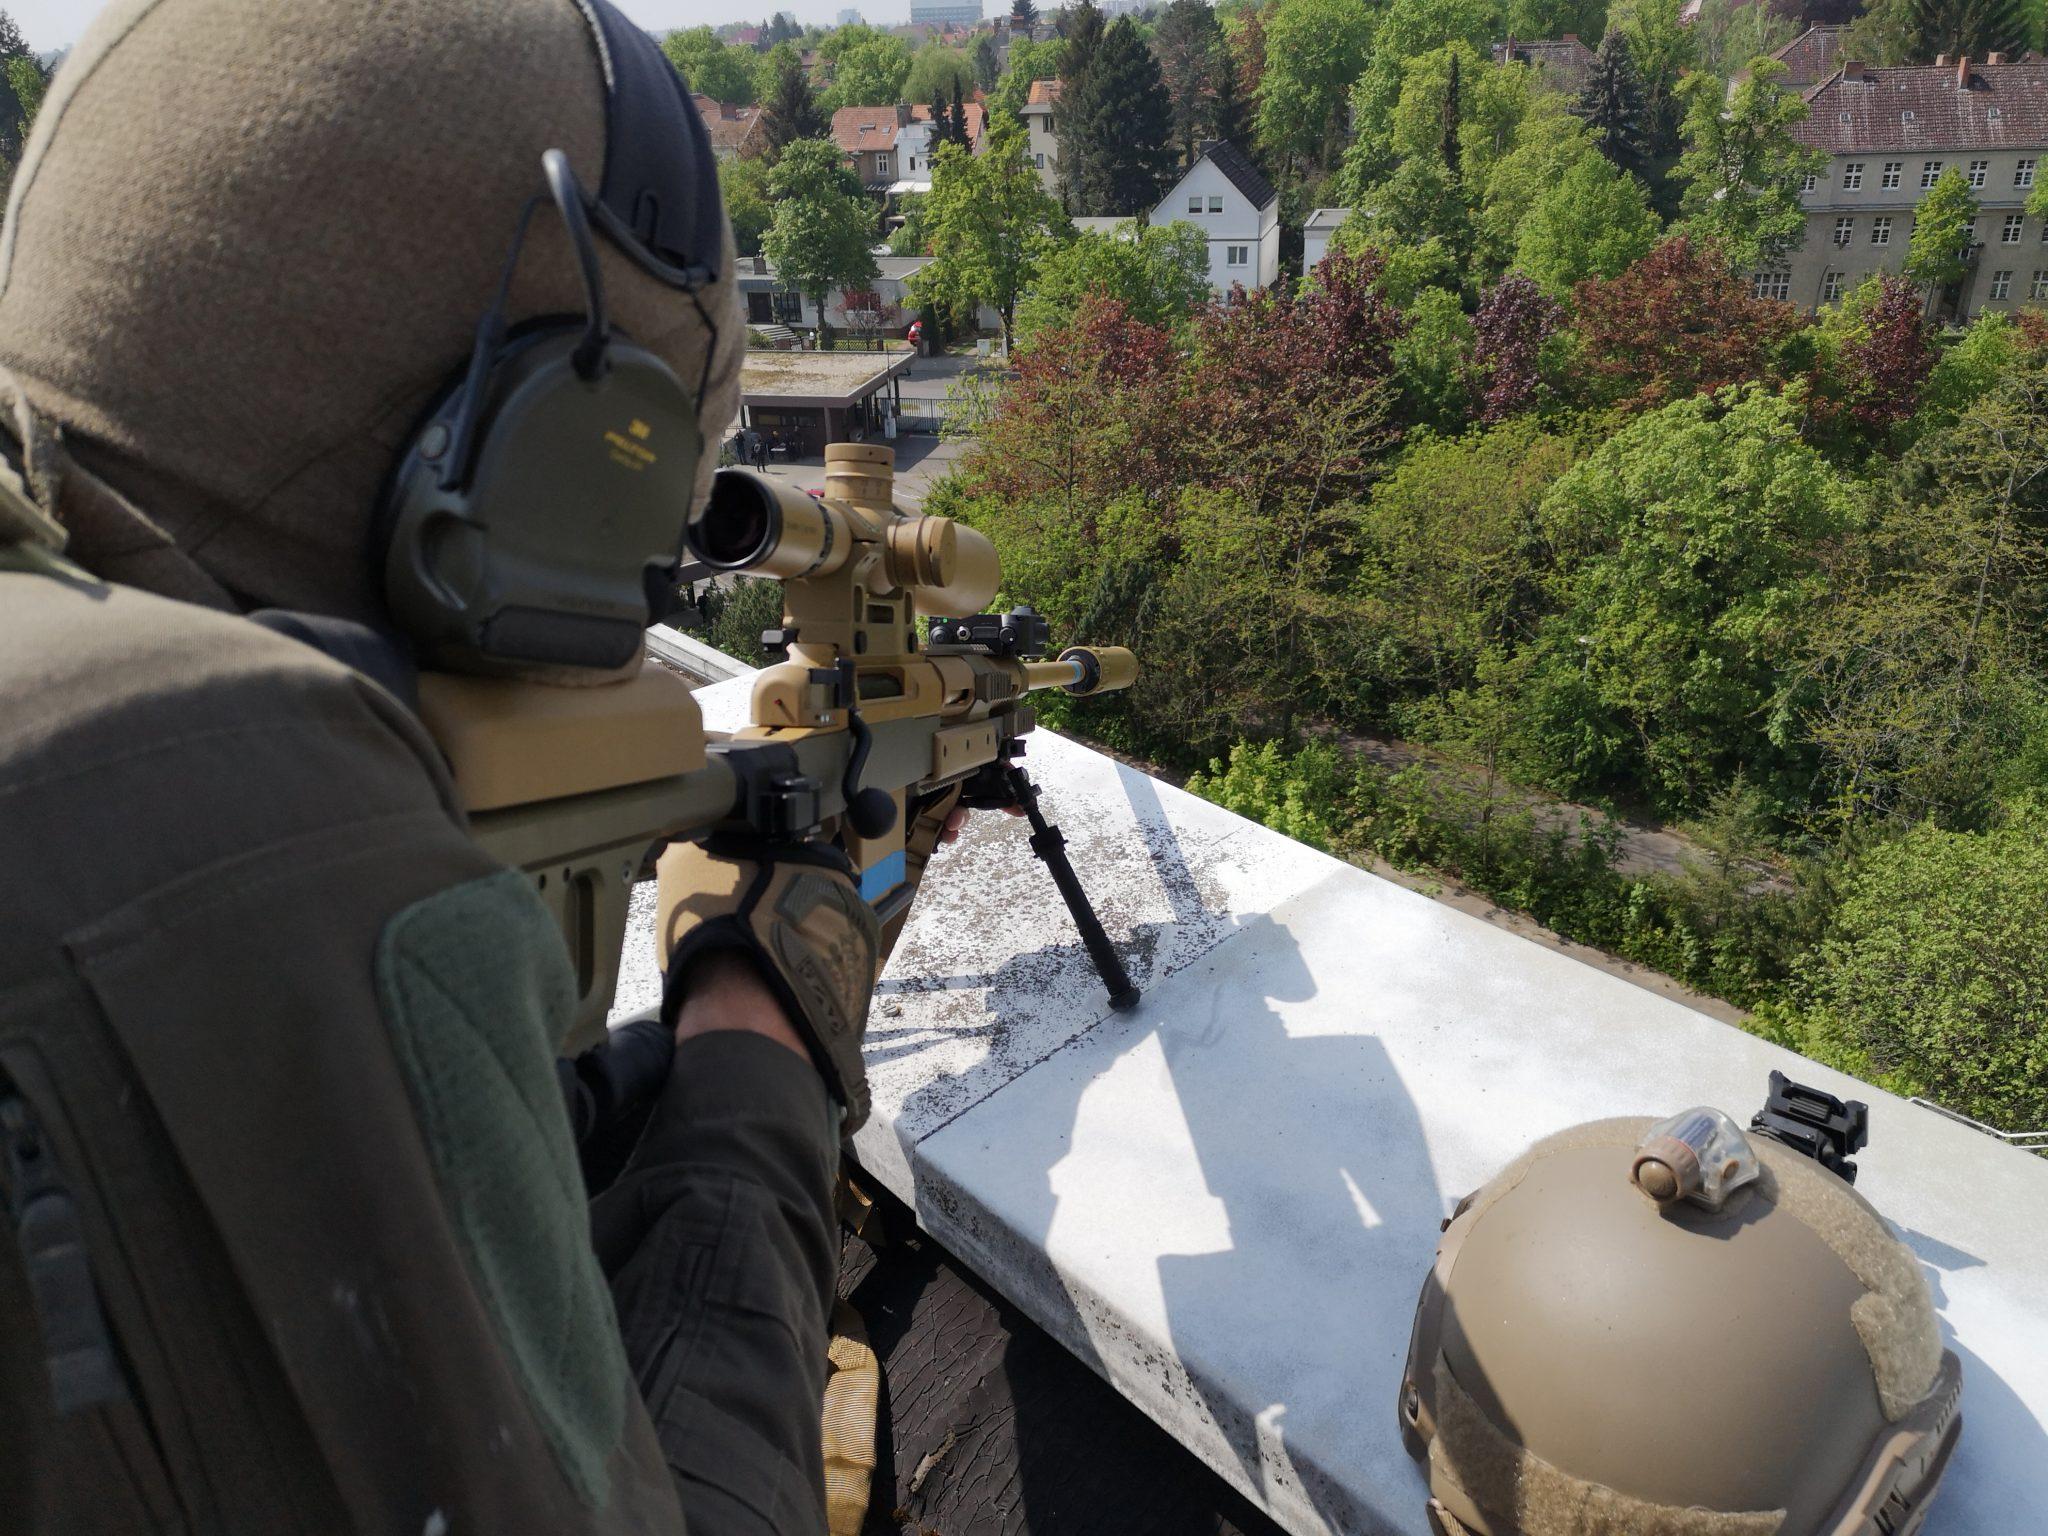 MG Action, MG Forces, Special Forces für Film, SEK Film, GSG9 Film, Polizei Film, Scharfschütze, Sniper post, Haenel RS9